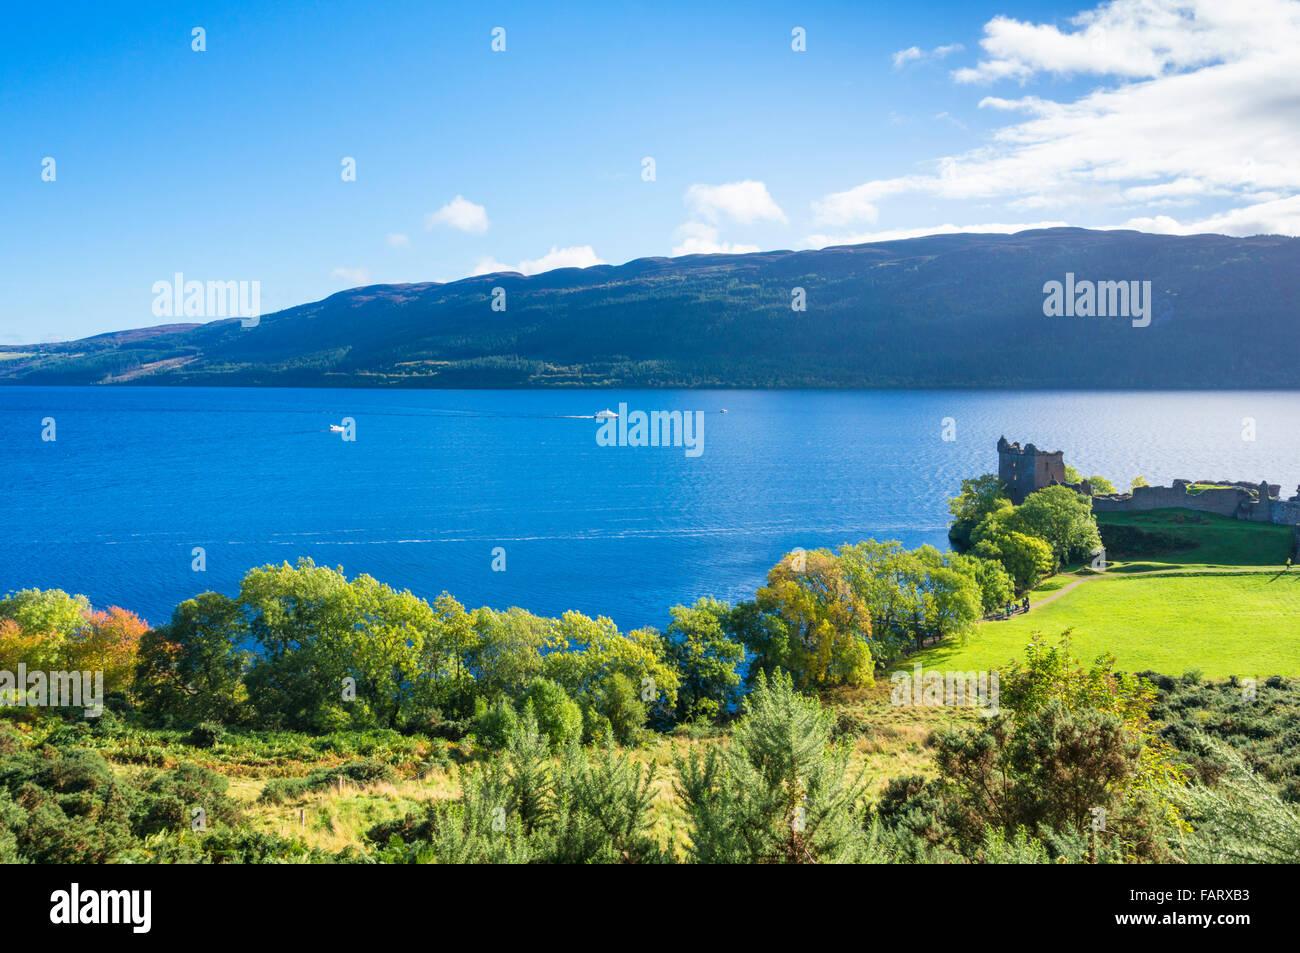 Urquhart Castle next to Loch Ness on Strone Point near Drumnadrochit village Highlands of Scotland UK GB EU Europe - Stock Image